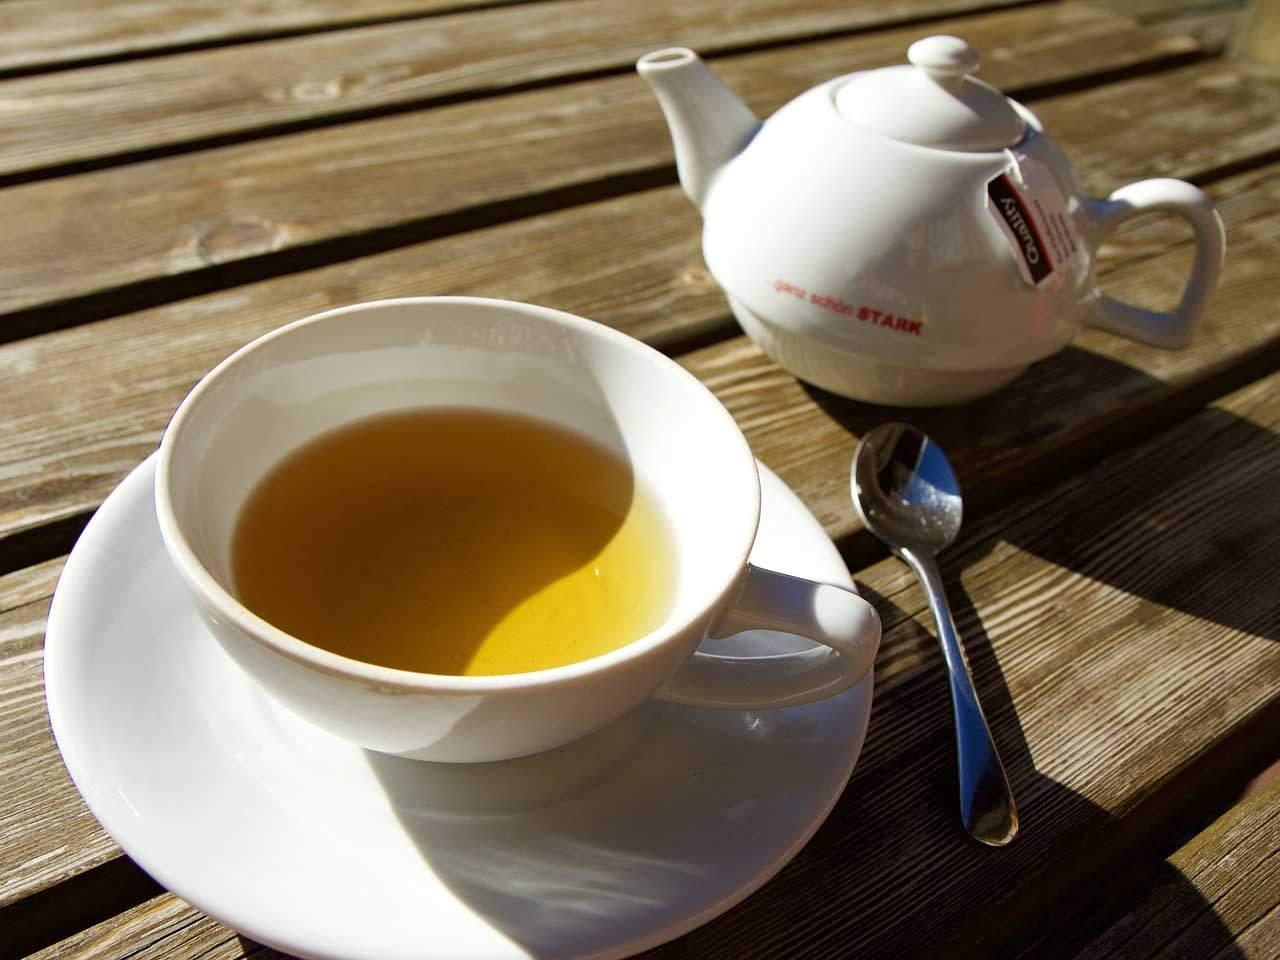 Tipp um den Stoffwechsel anzuregen - > Tee